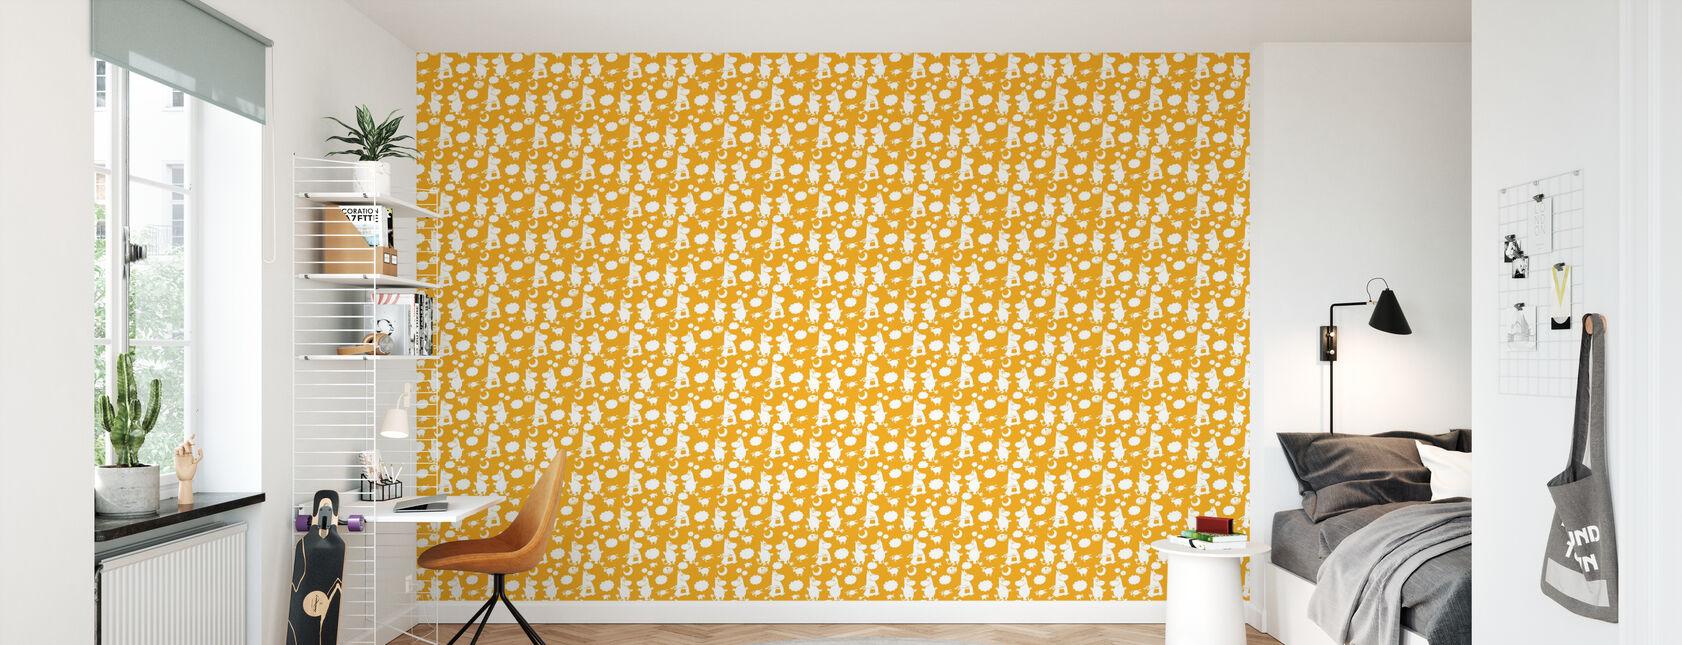 Moomin Retro Pattern - Yellow - Wallpaper - Kids Room